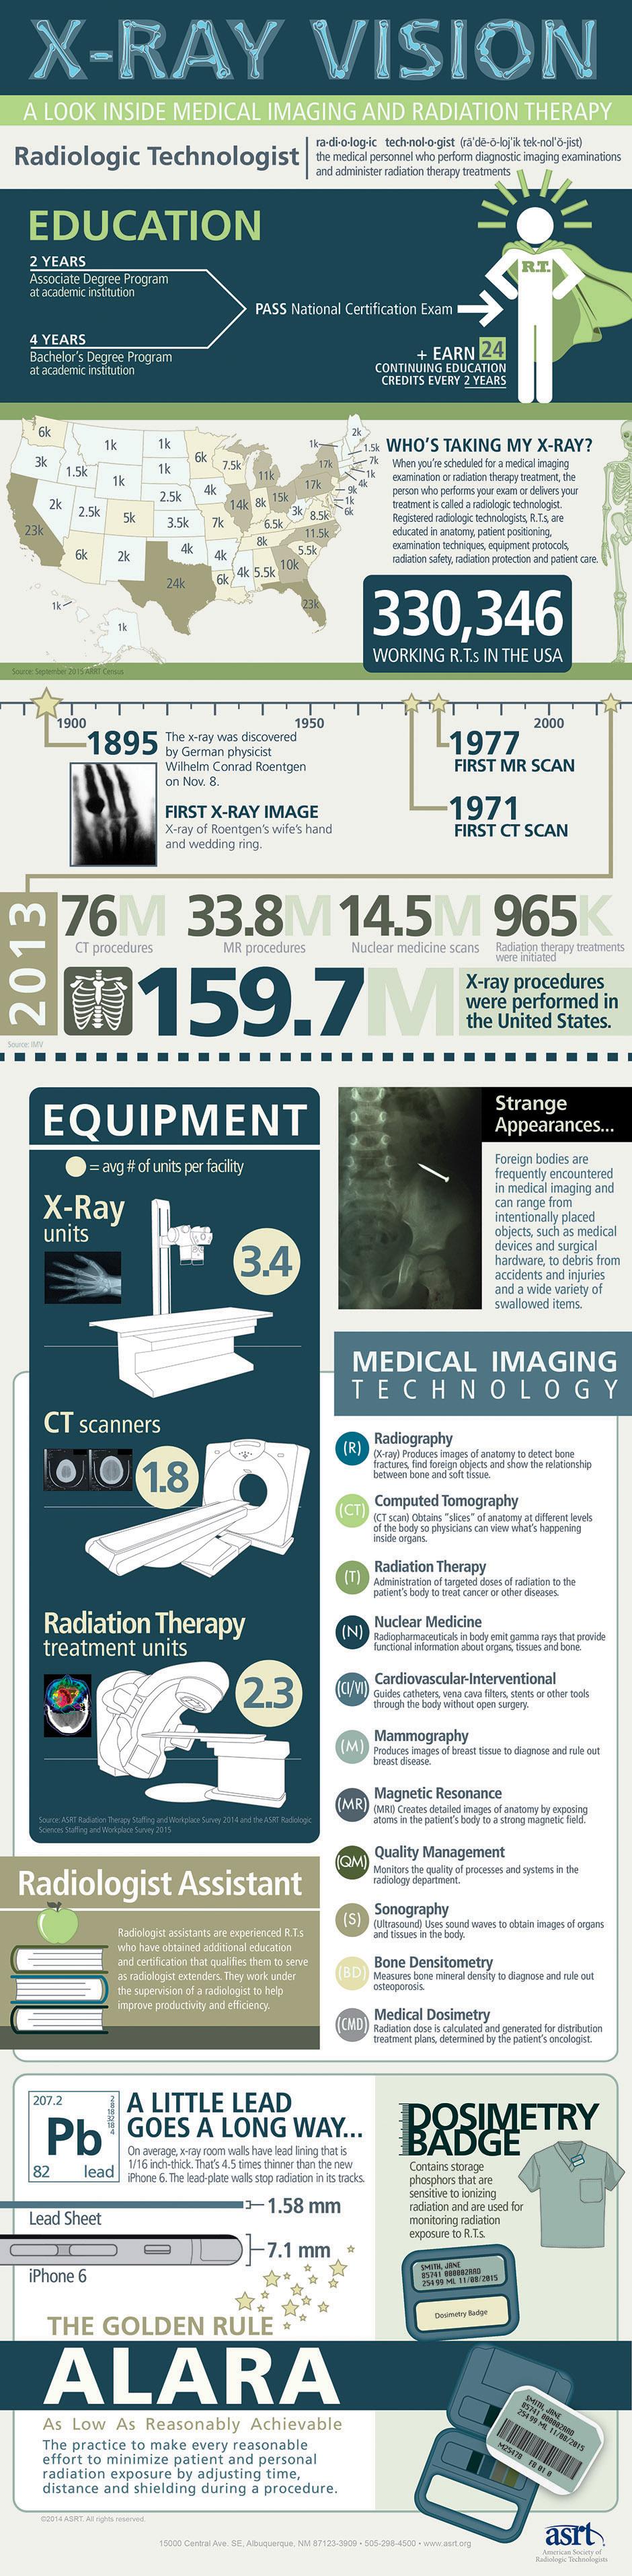 nrtw14_infographic-web-940px.jpg